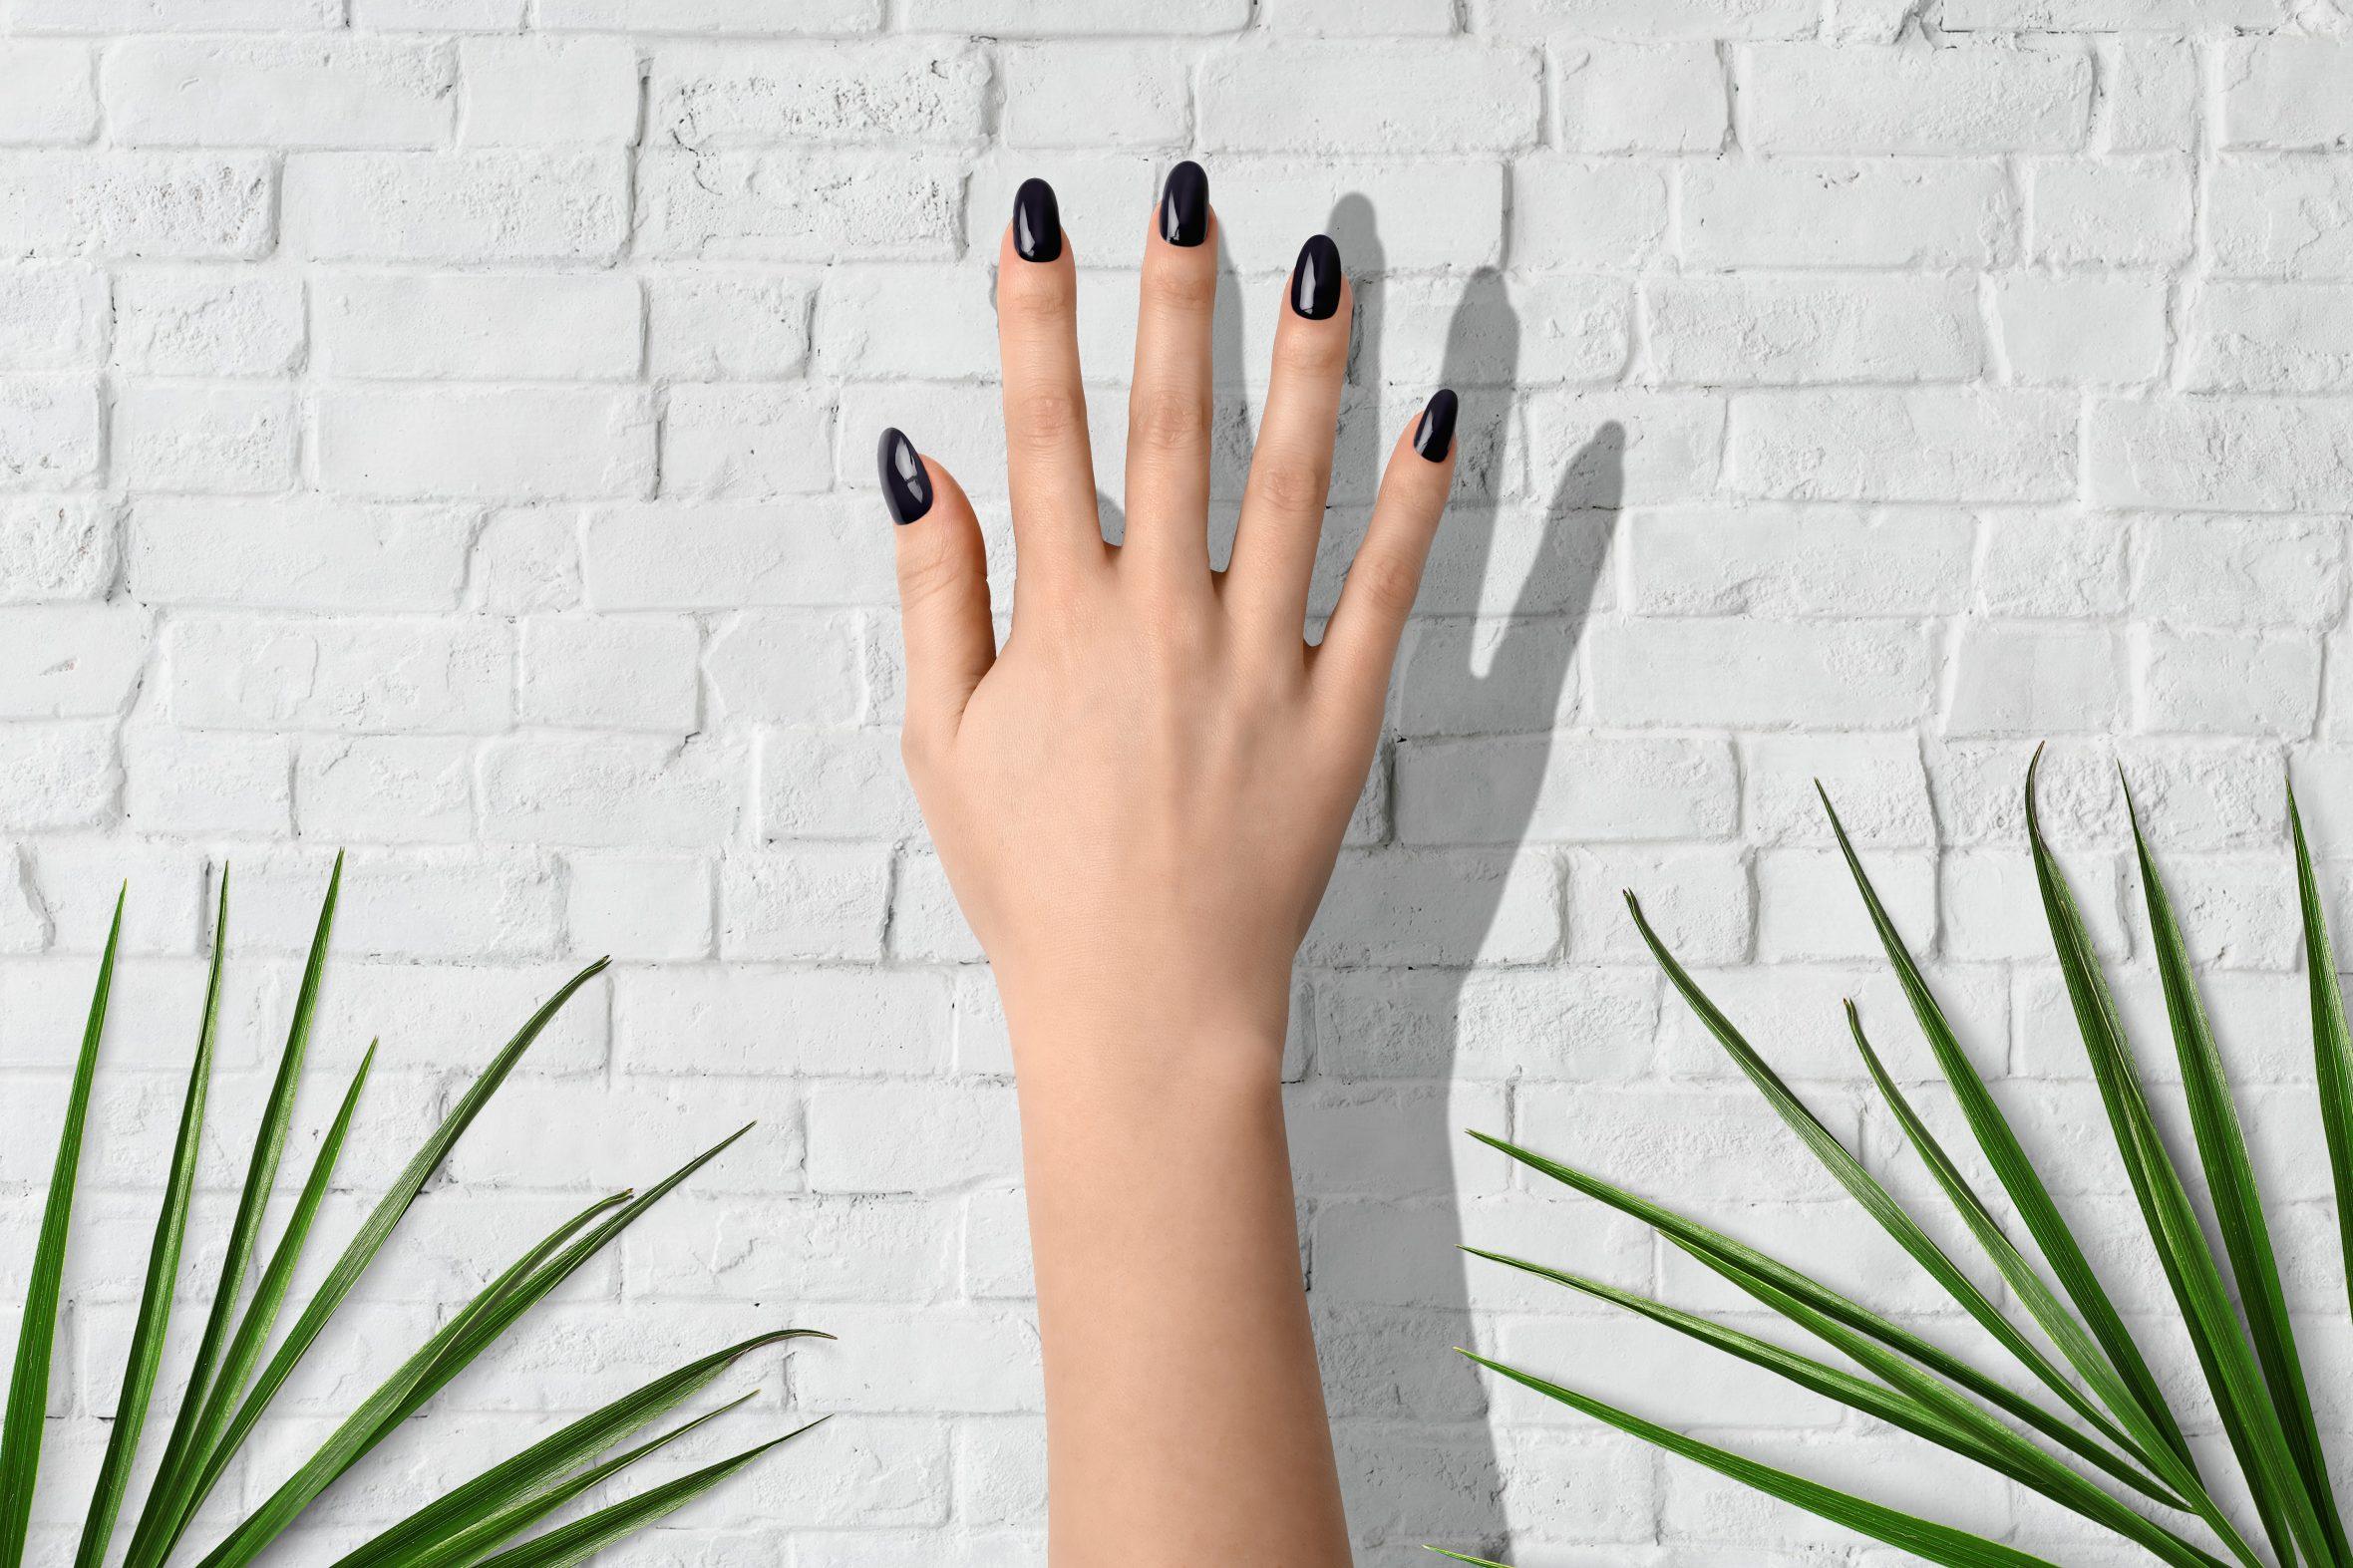 Donker paarse nagellak van Herôme voor manicure